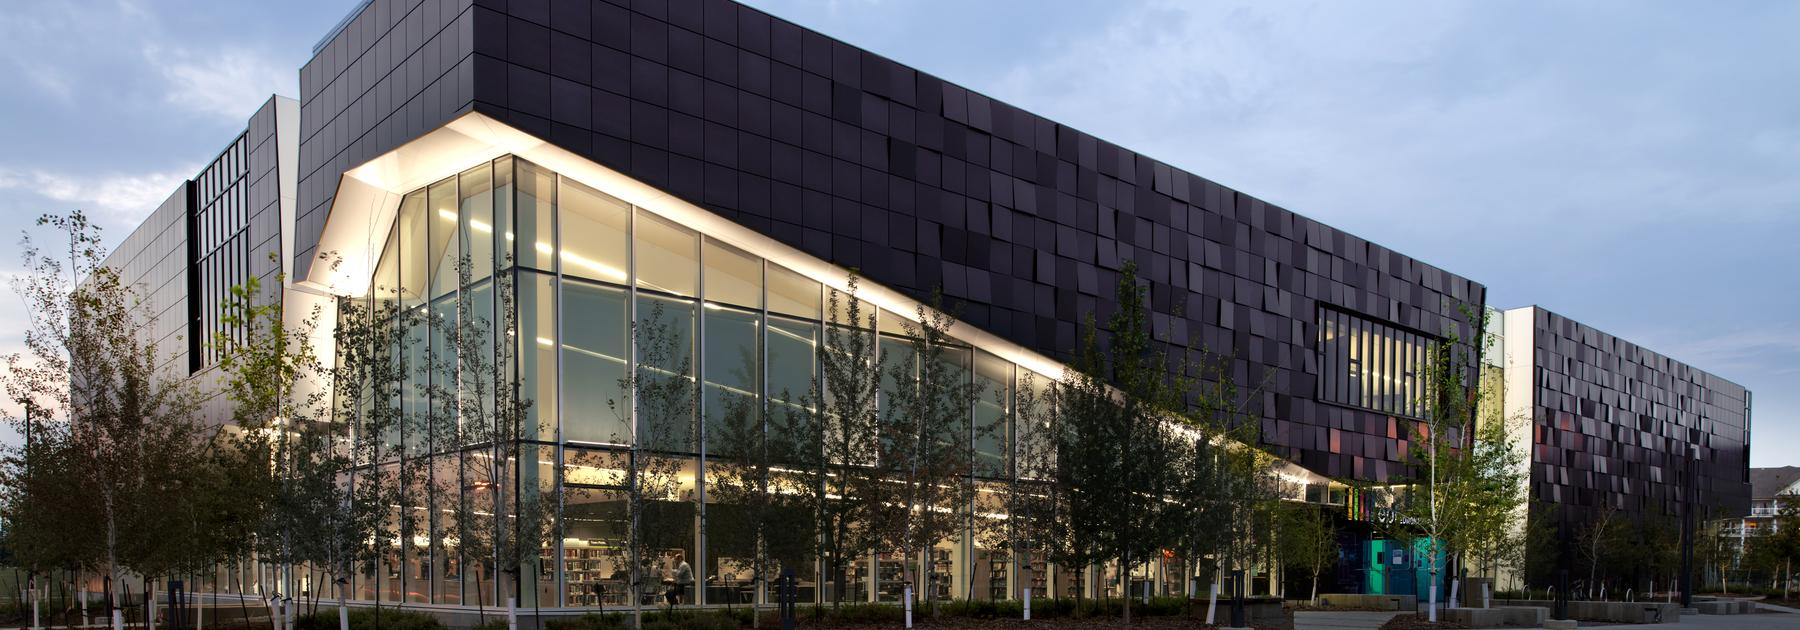 Architectural facade systems